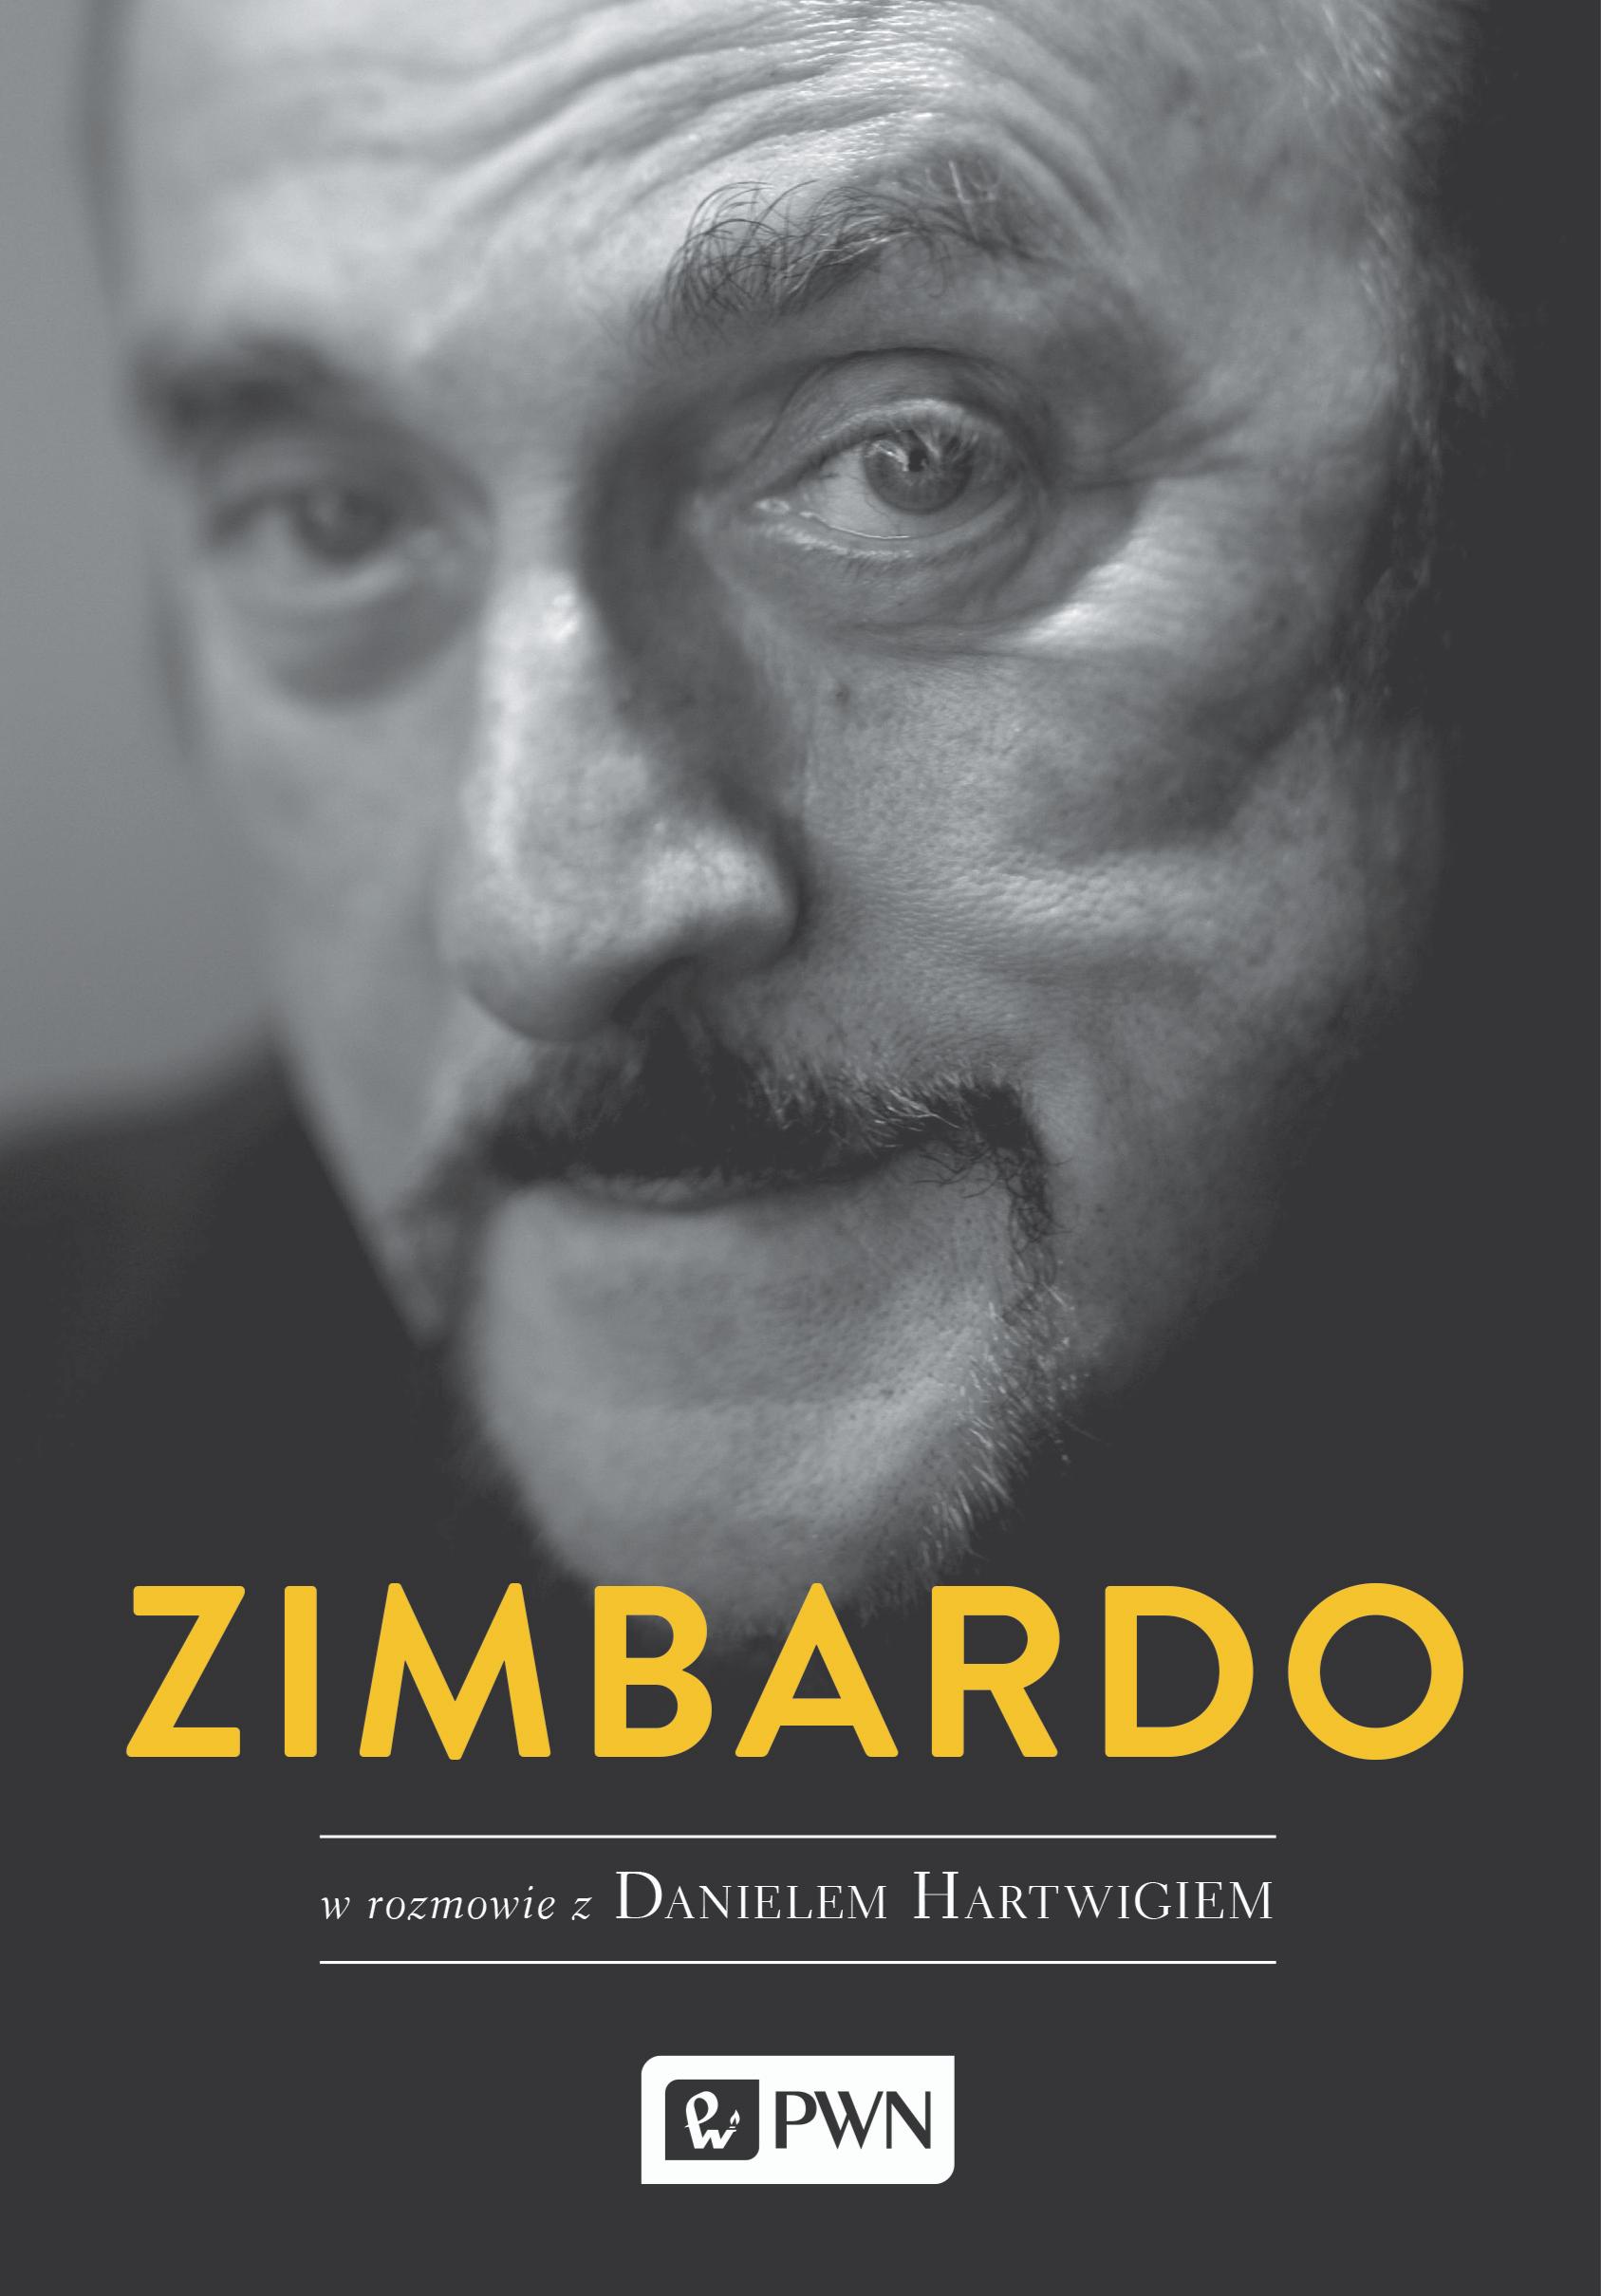 Jak zostać bohaterem? Pytamy prof. Philipa Zimbardo